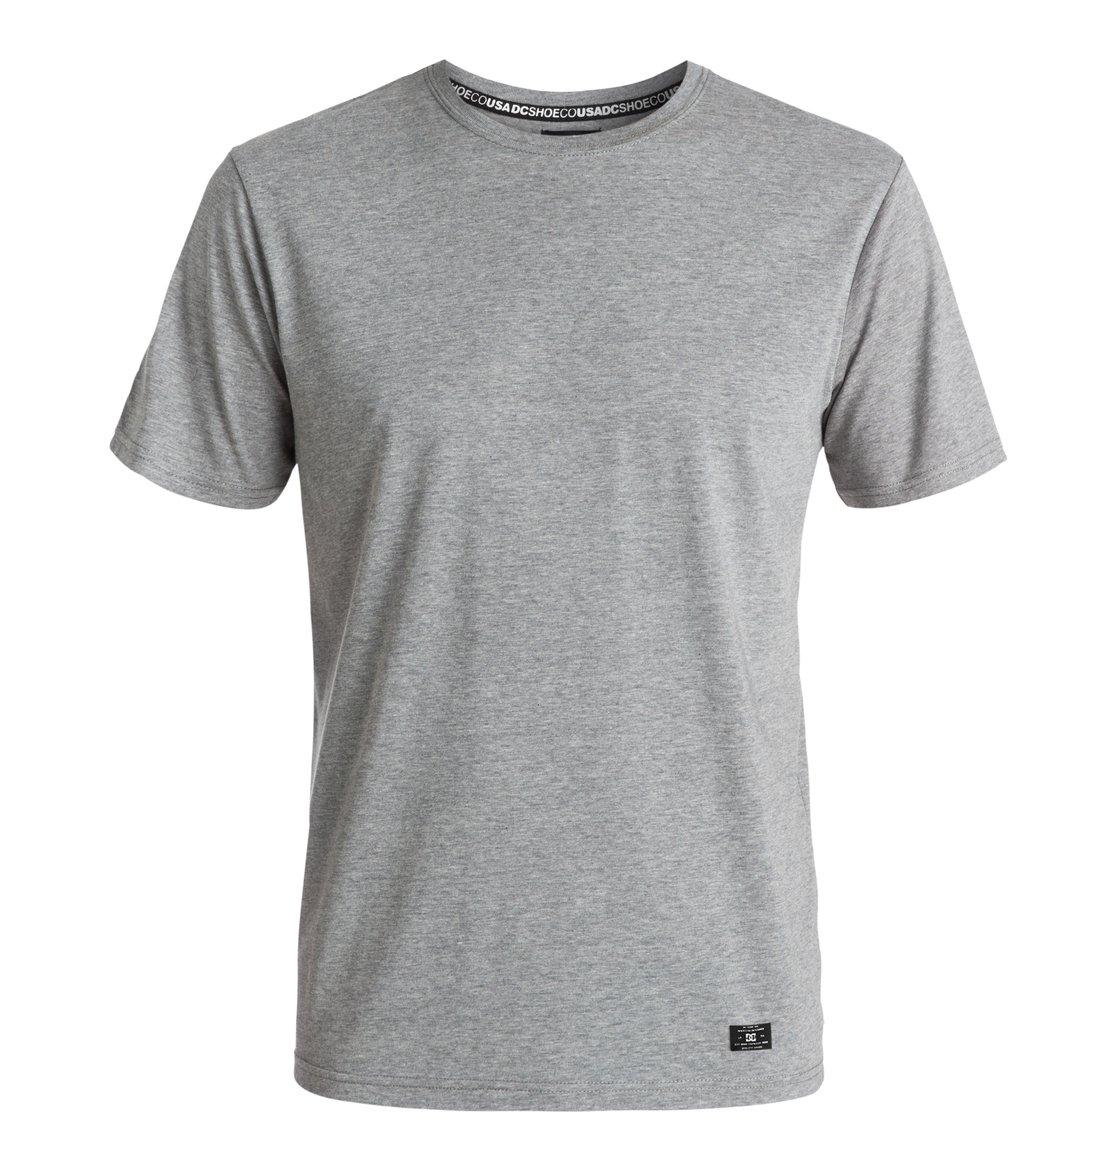 Basic - T-shirt 3613370588978 | DC Shoes